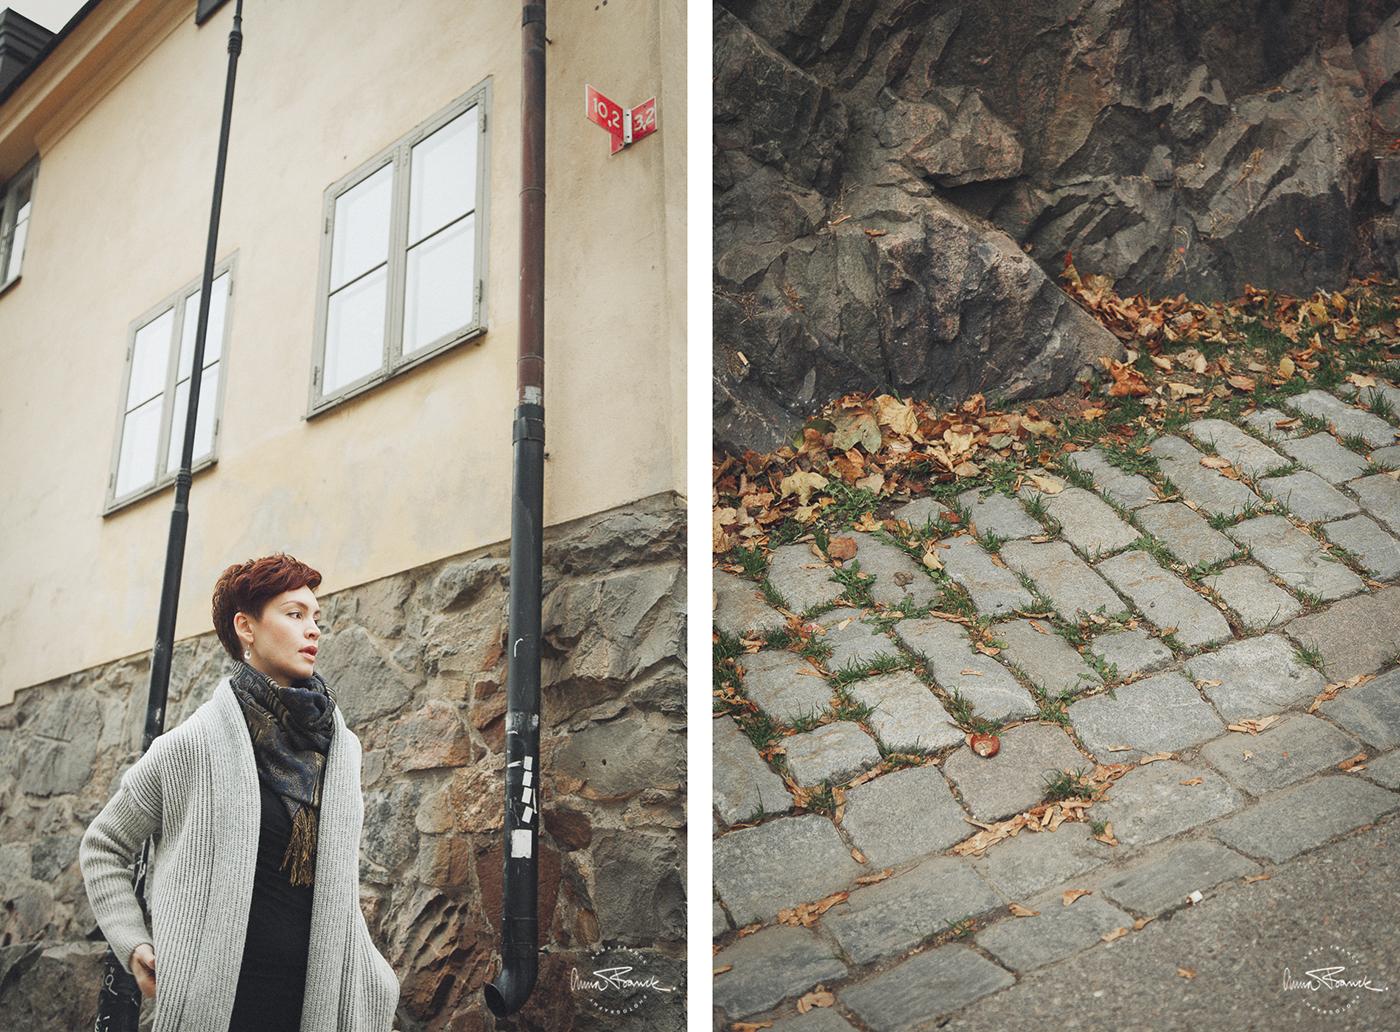 anna, franck, photography, fotograf, valokuvaaja, stockholm, finland, sverige, porträtt, portrait, muotokuva, enjoy, södermalm, natural, soft, light, autumn, chilly, relaxed, beautiful, lovely, trees, leaves, park